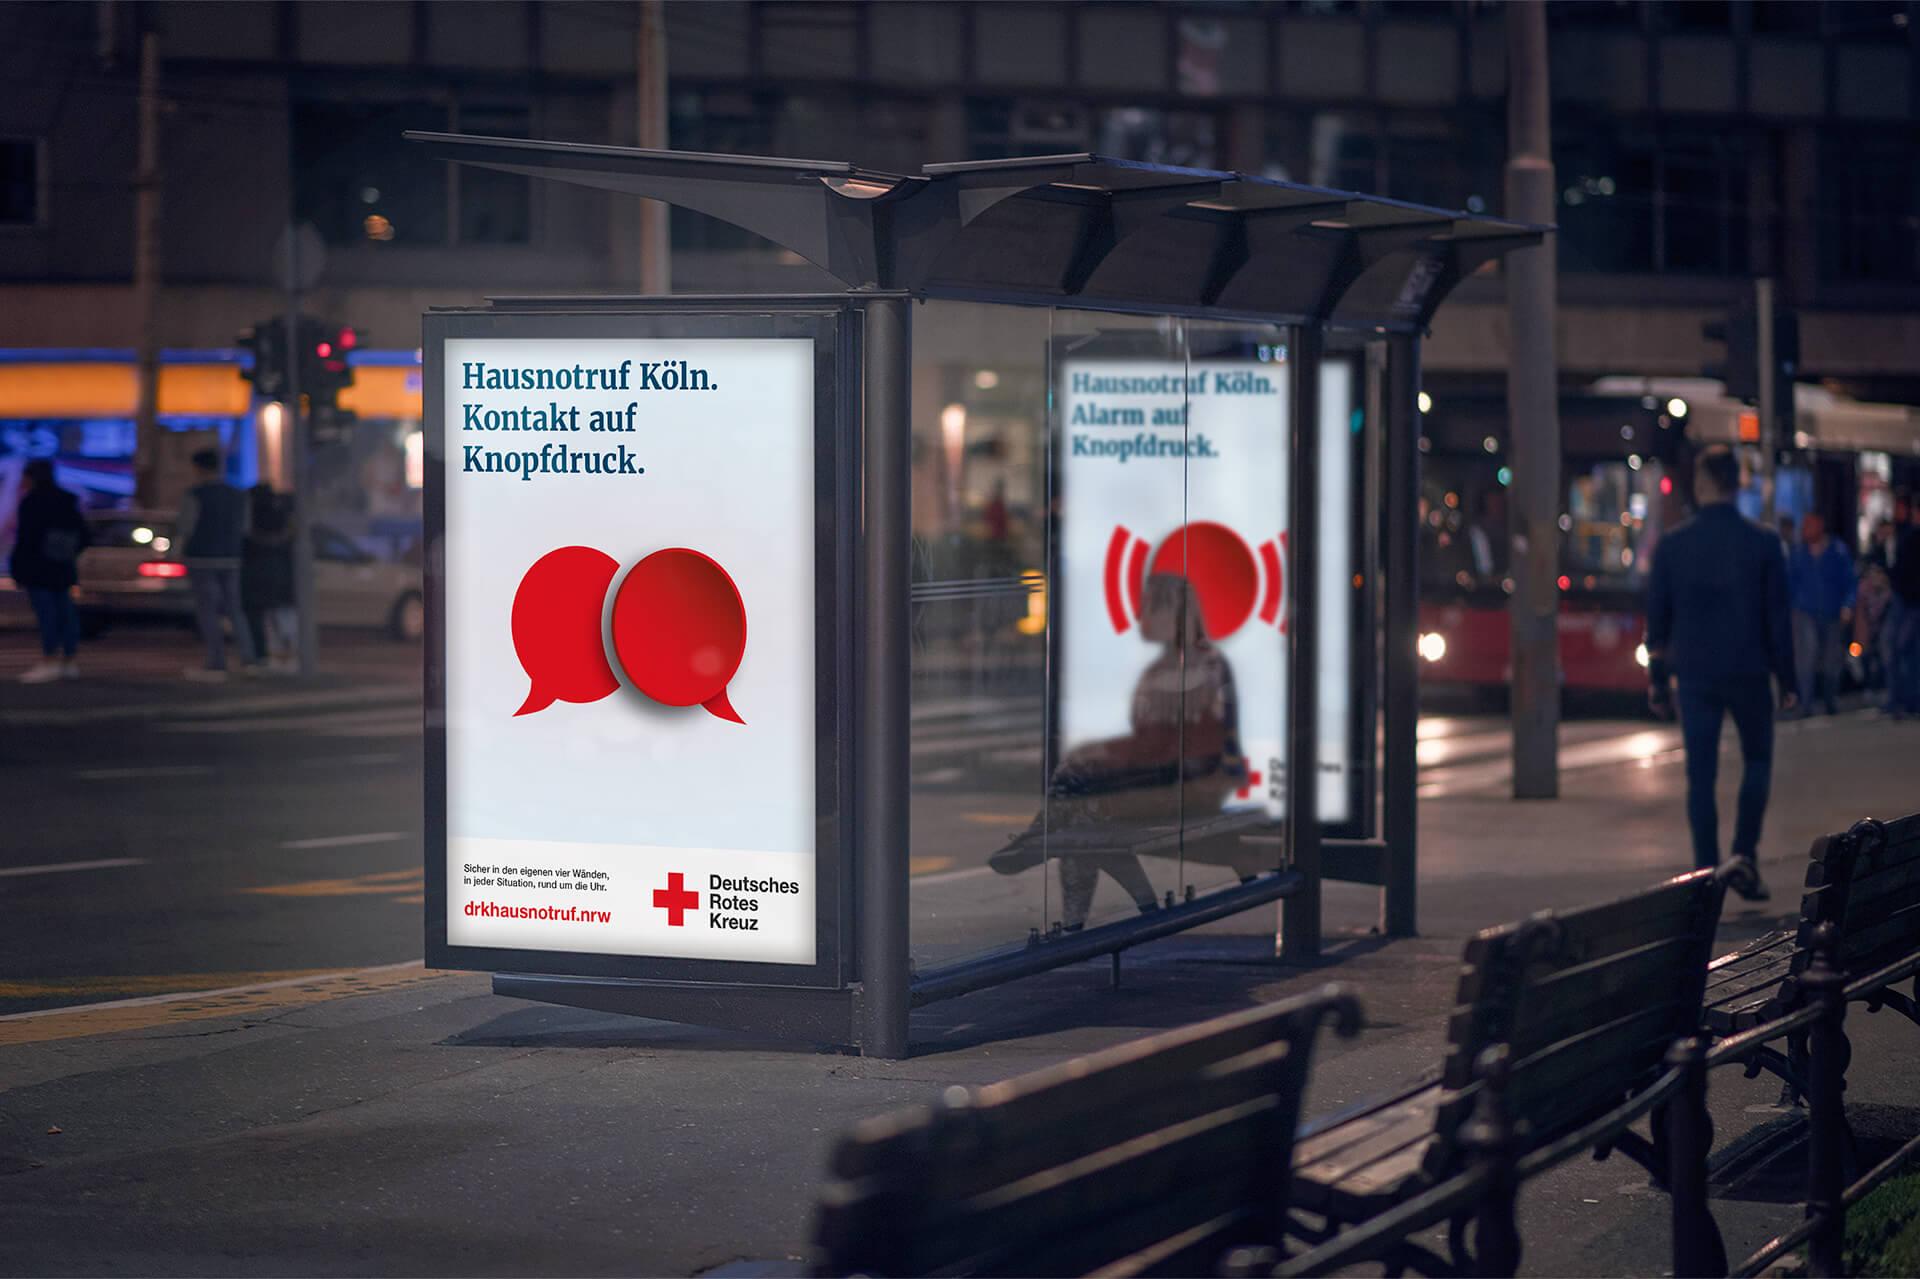 Citylightplakate für Imagekampagne Hausnotruf